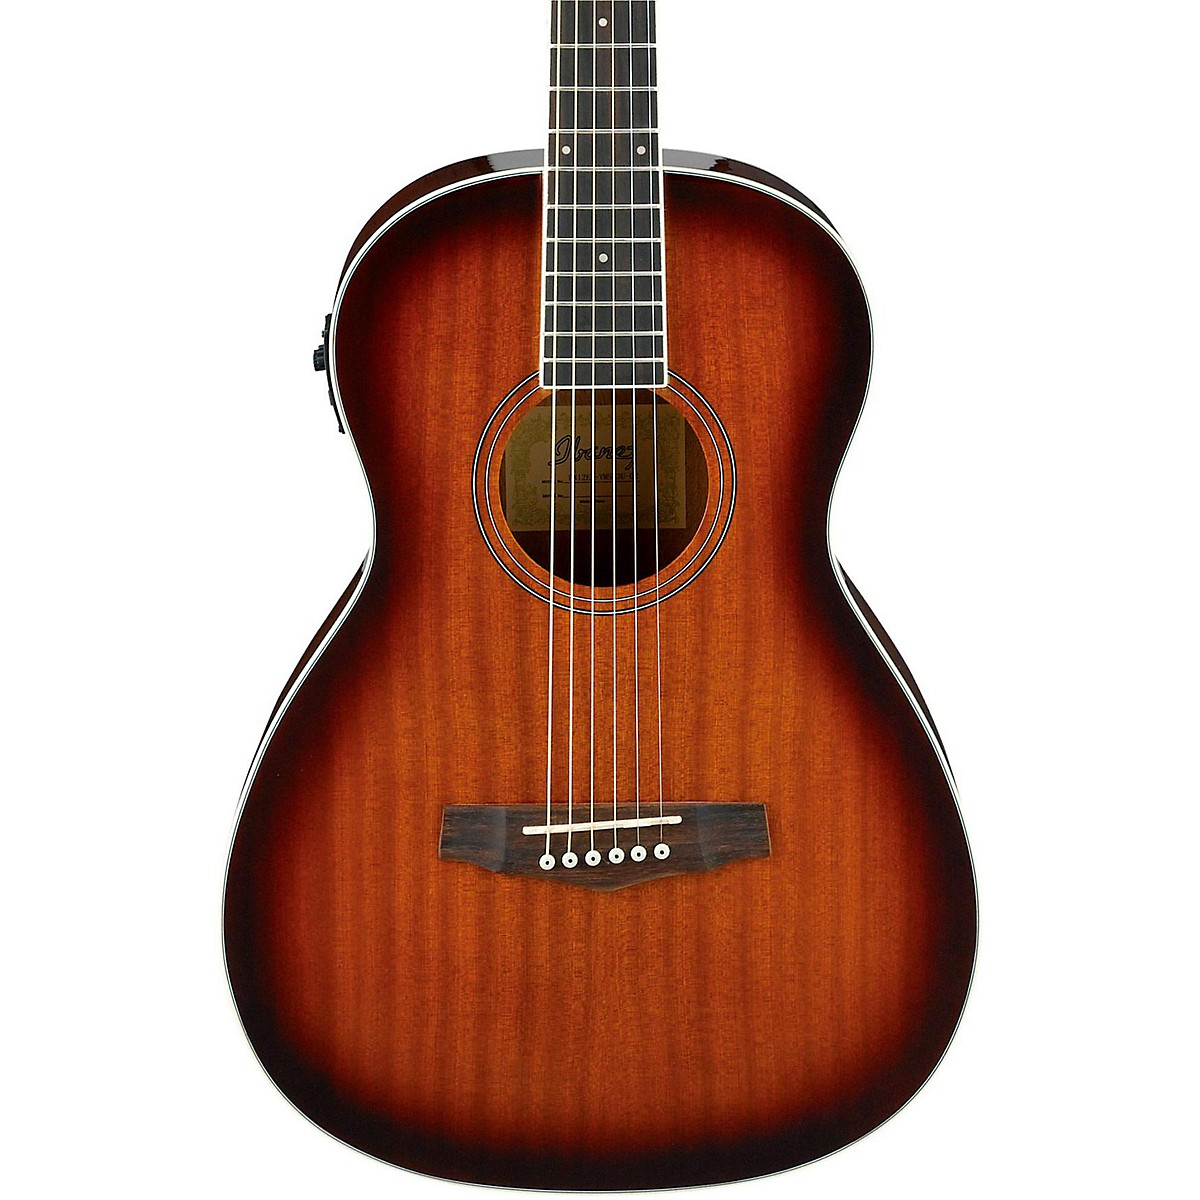 Ibanez PN12E Mahogany Parlor Acoustic-Electric Guitar